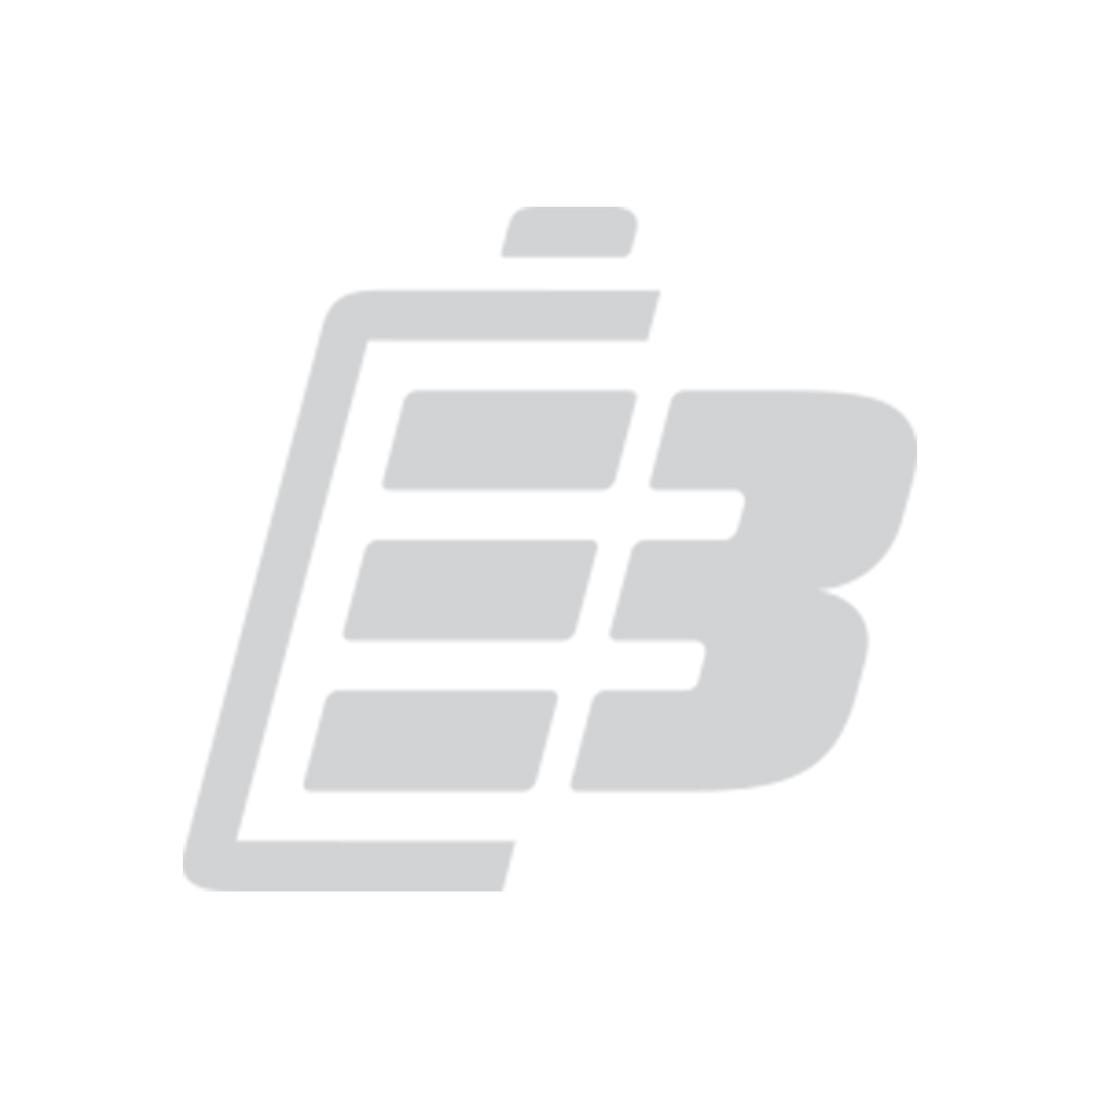 Smartphone battery Zopo zp700_1